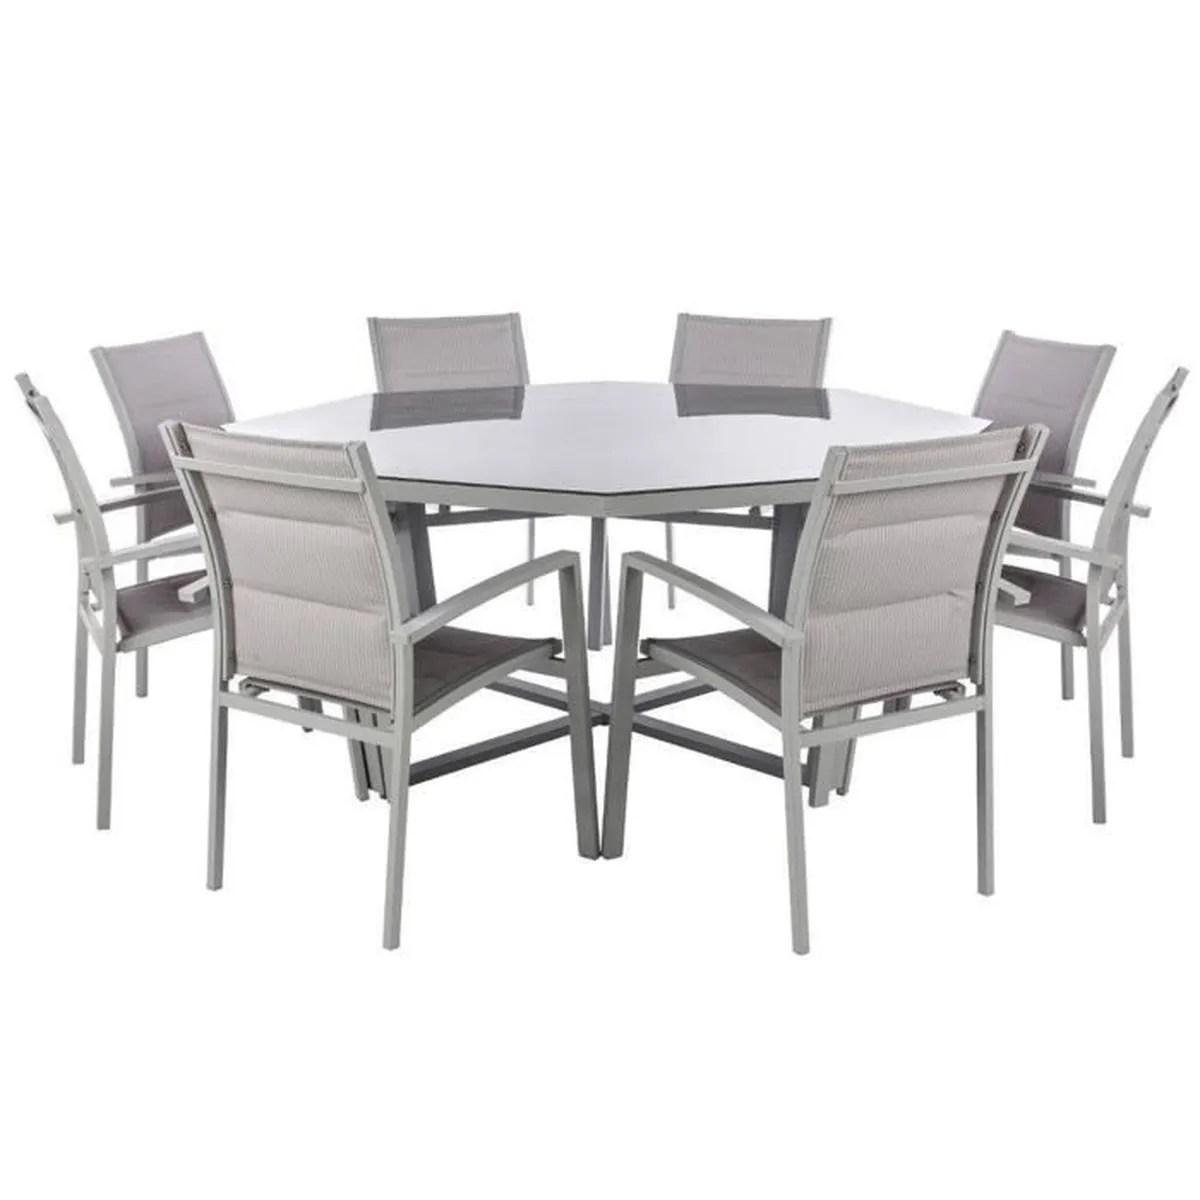 table octogonale en aluminium et verre